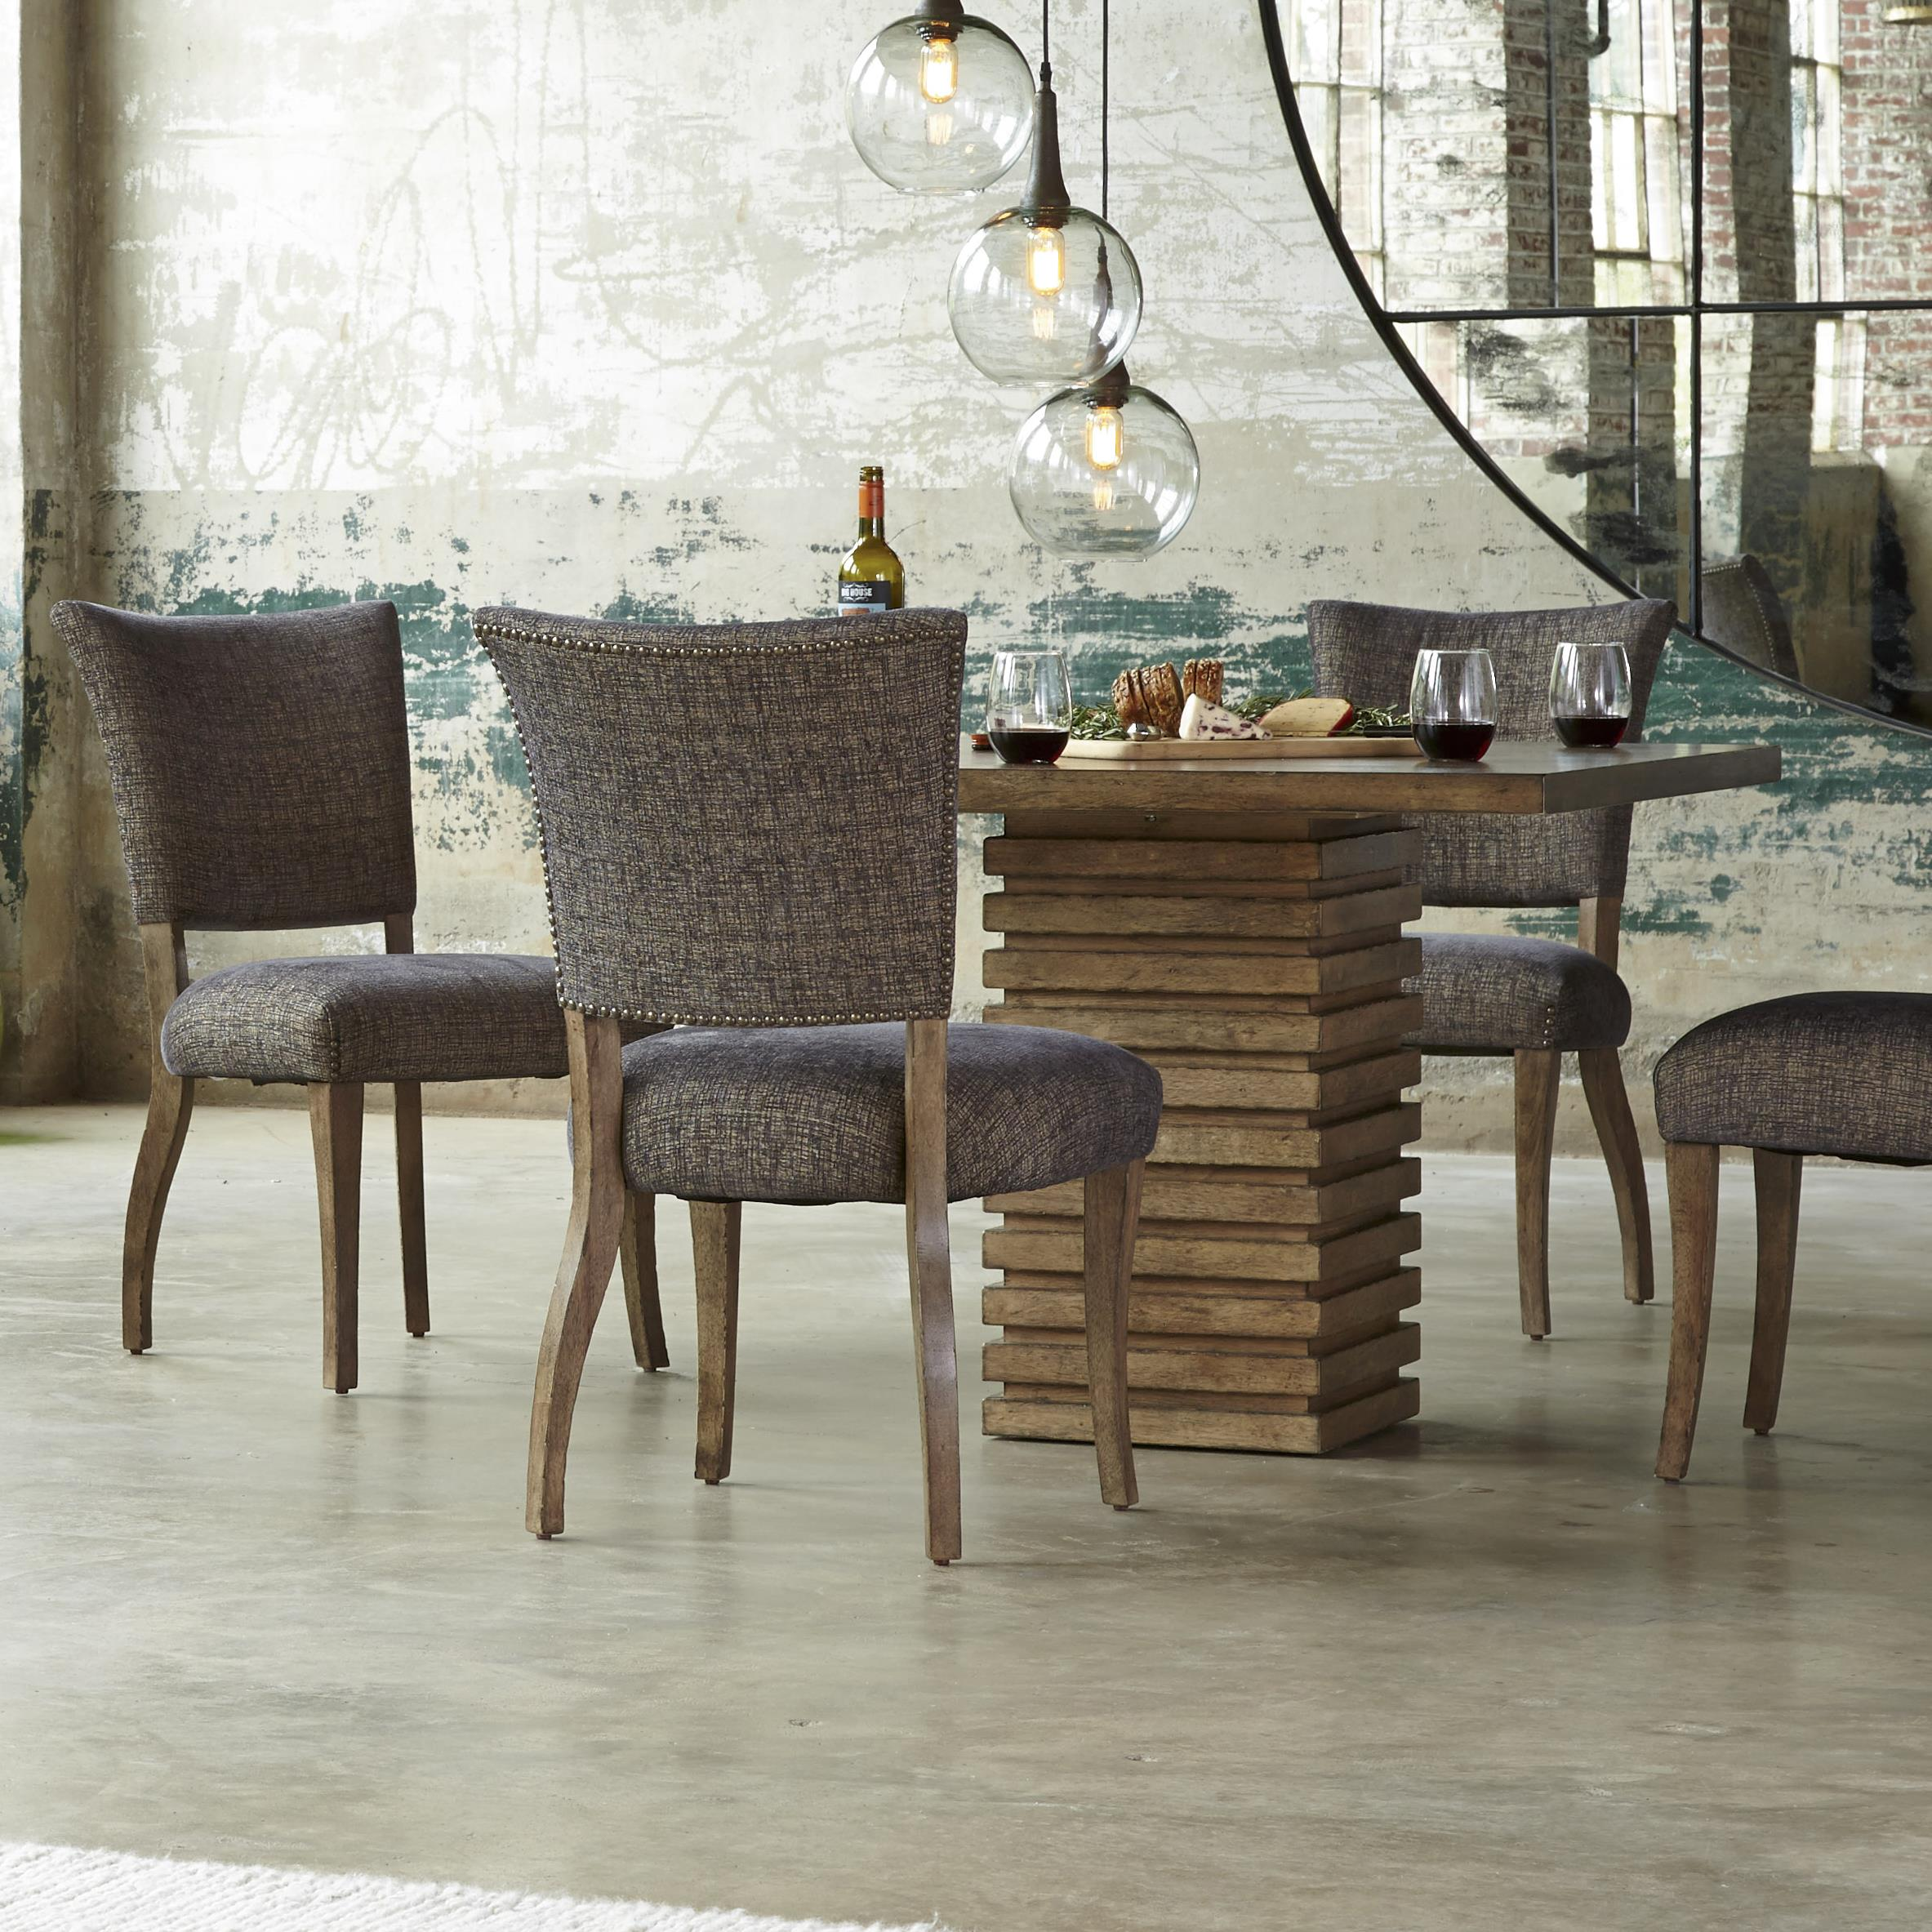 Belfort Signature Urban Treasures 5-Piece Shaw Pedestal Dining Table Set - Item Number: 223222-2302+4x223202